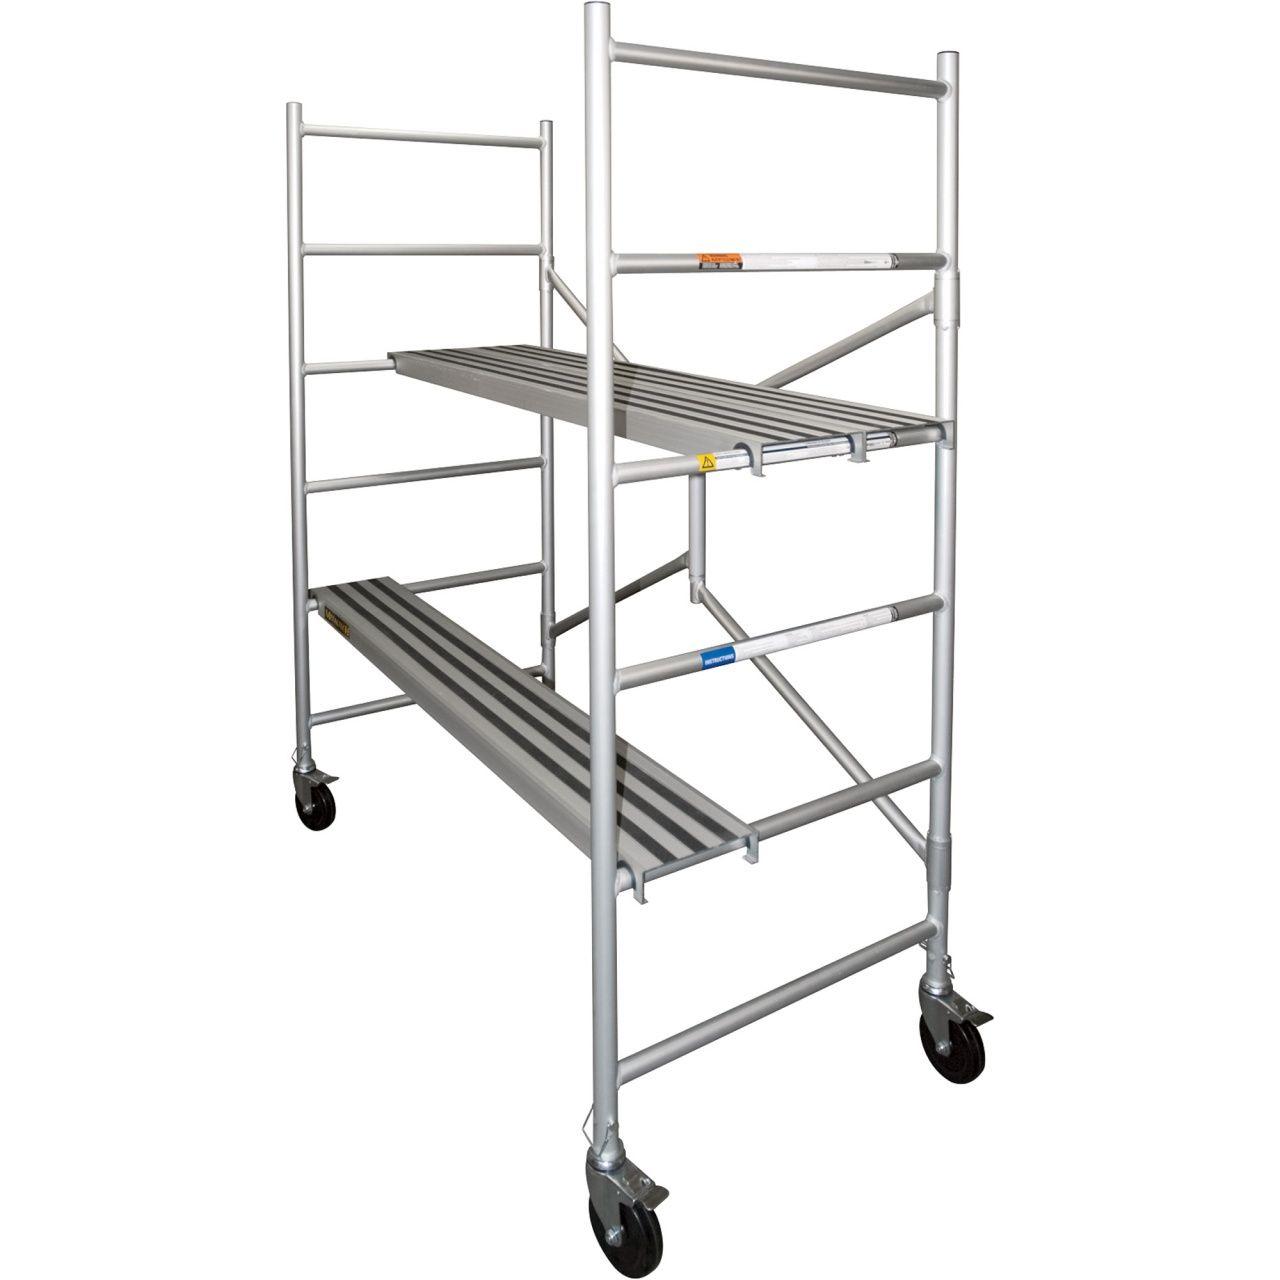 Roughneck Stair Climber Hand Truck Stair Railing Design Railing Design Stair Railing Kits